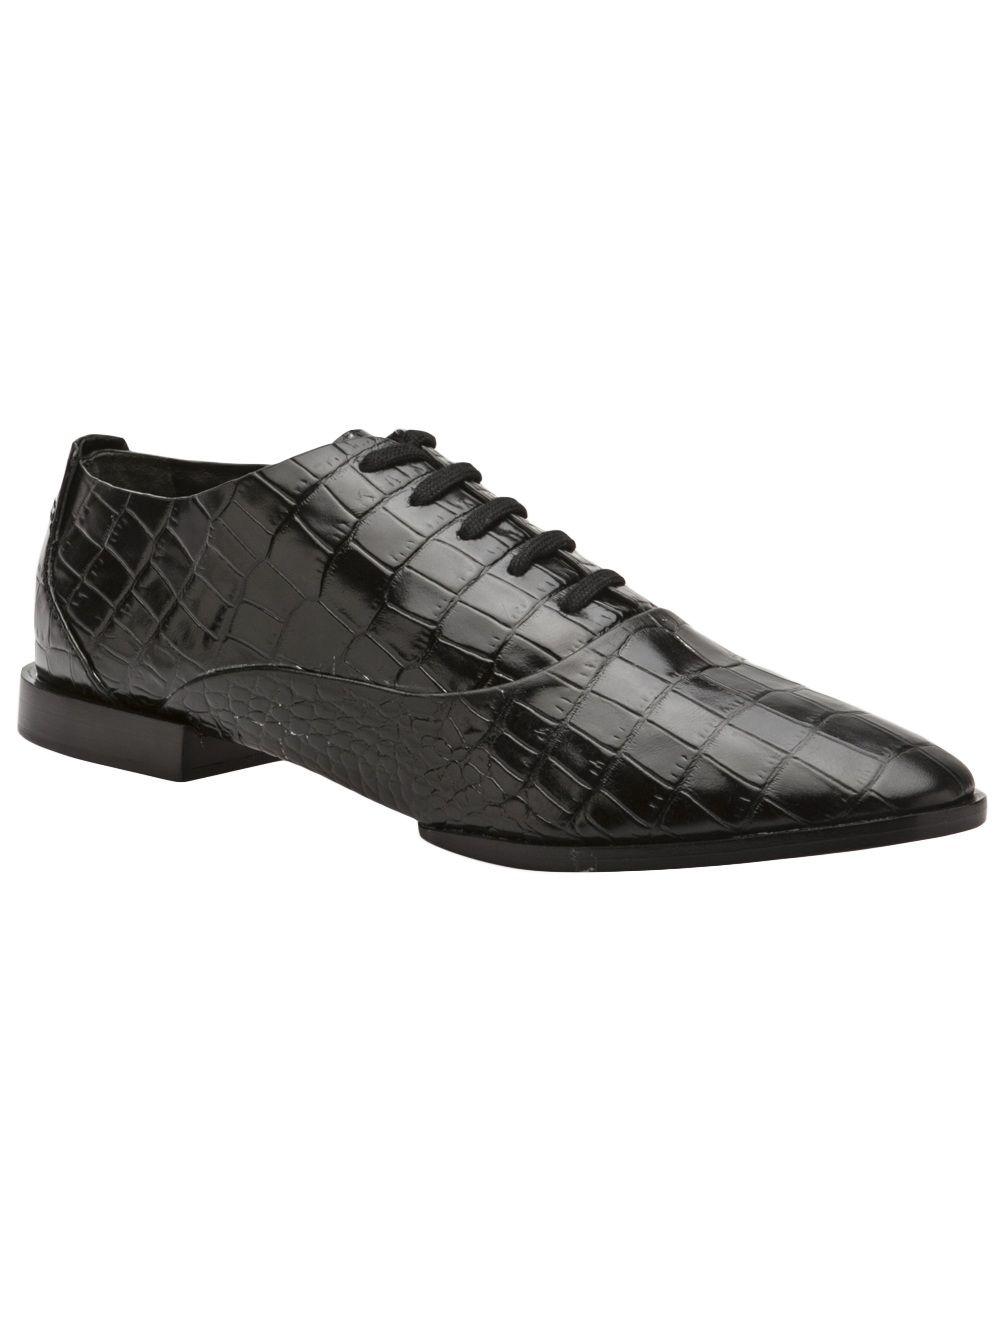 Alexander wang ingrid laceup oxford zoe shoes pinterest